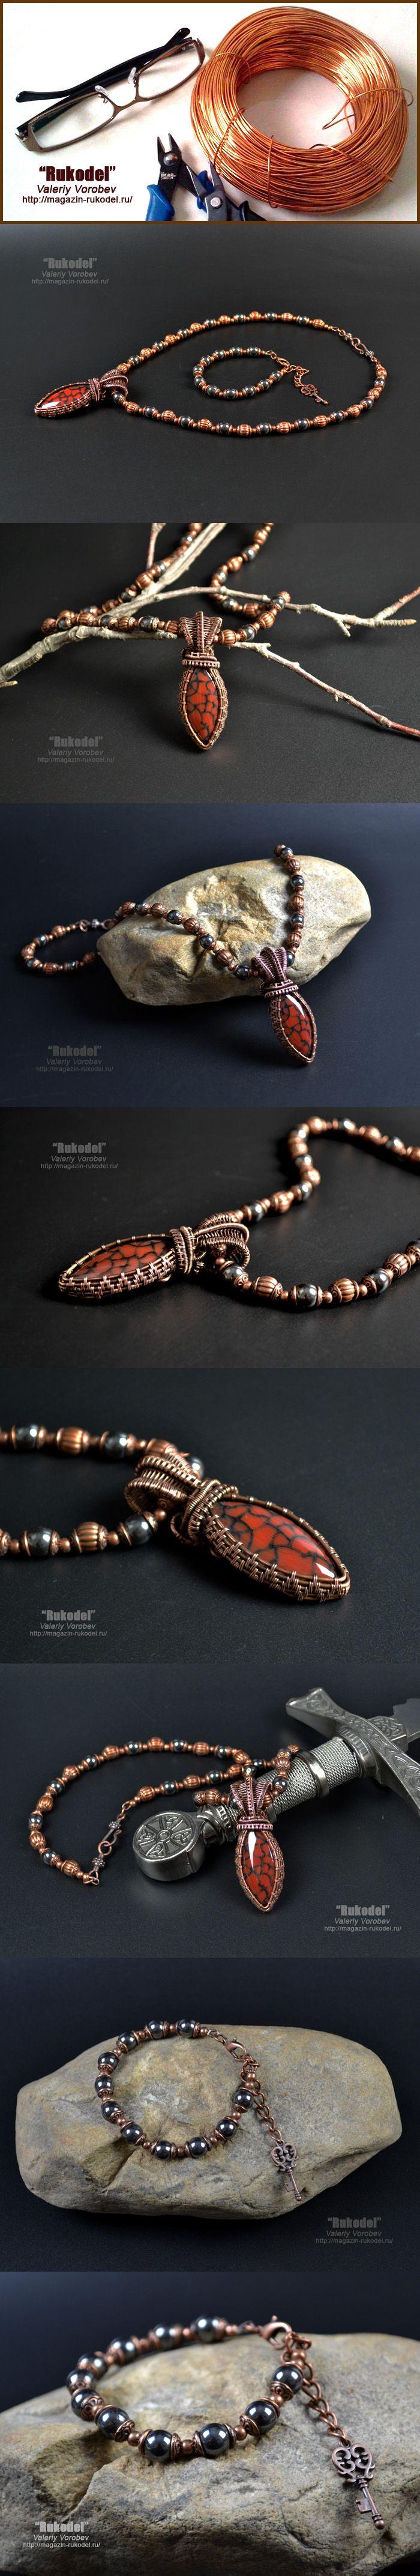 1103 best Jewelry Tutorials images on Pinterest | Arm candies ...